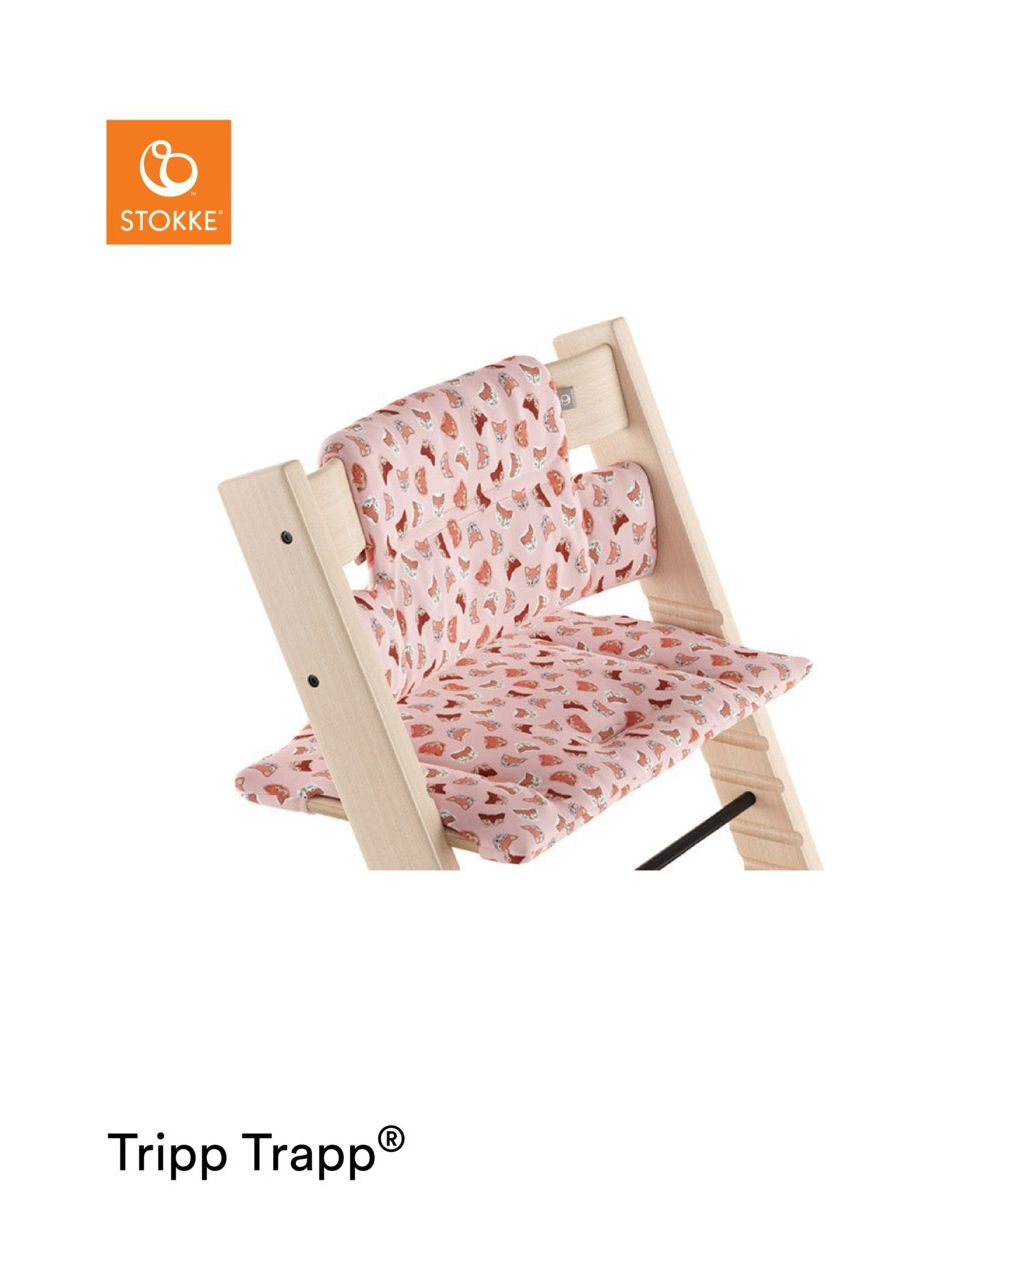 Tripp trapp® cuscino – pink fox - Stokke